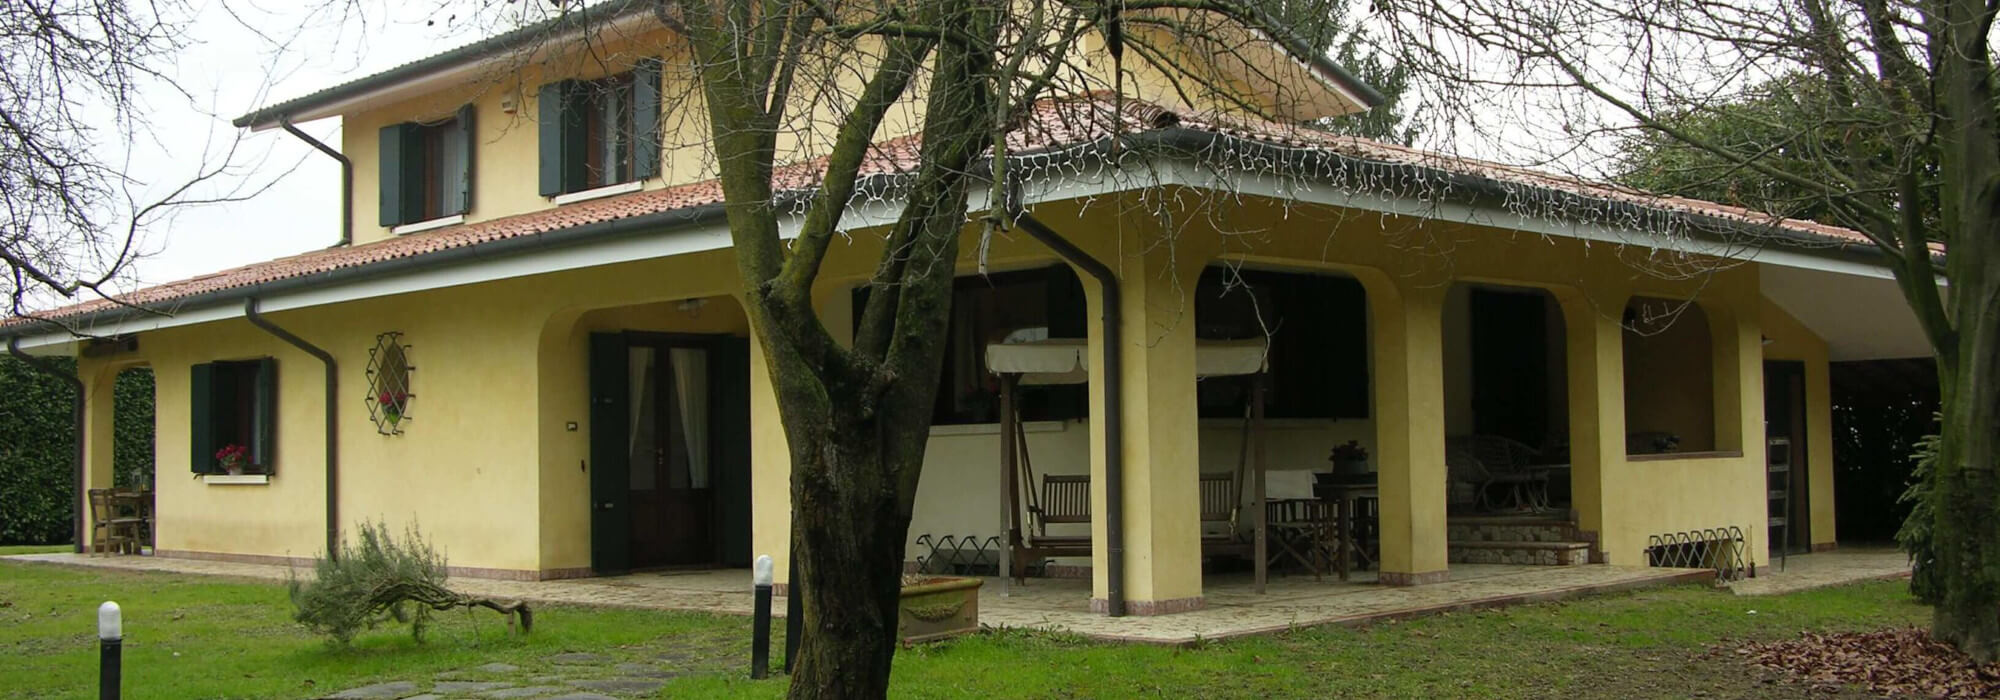 Villa singola a Lancenigo